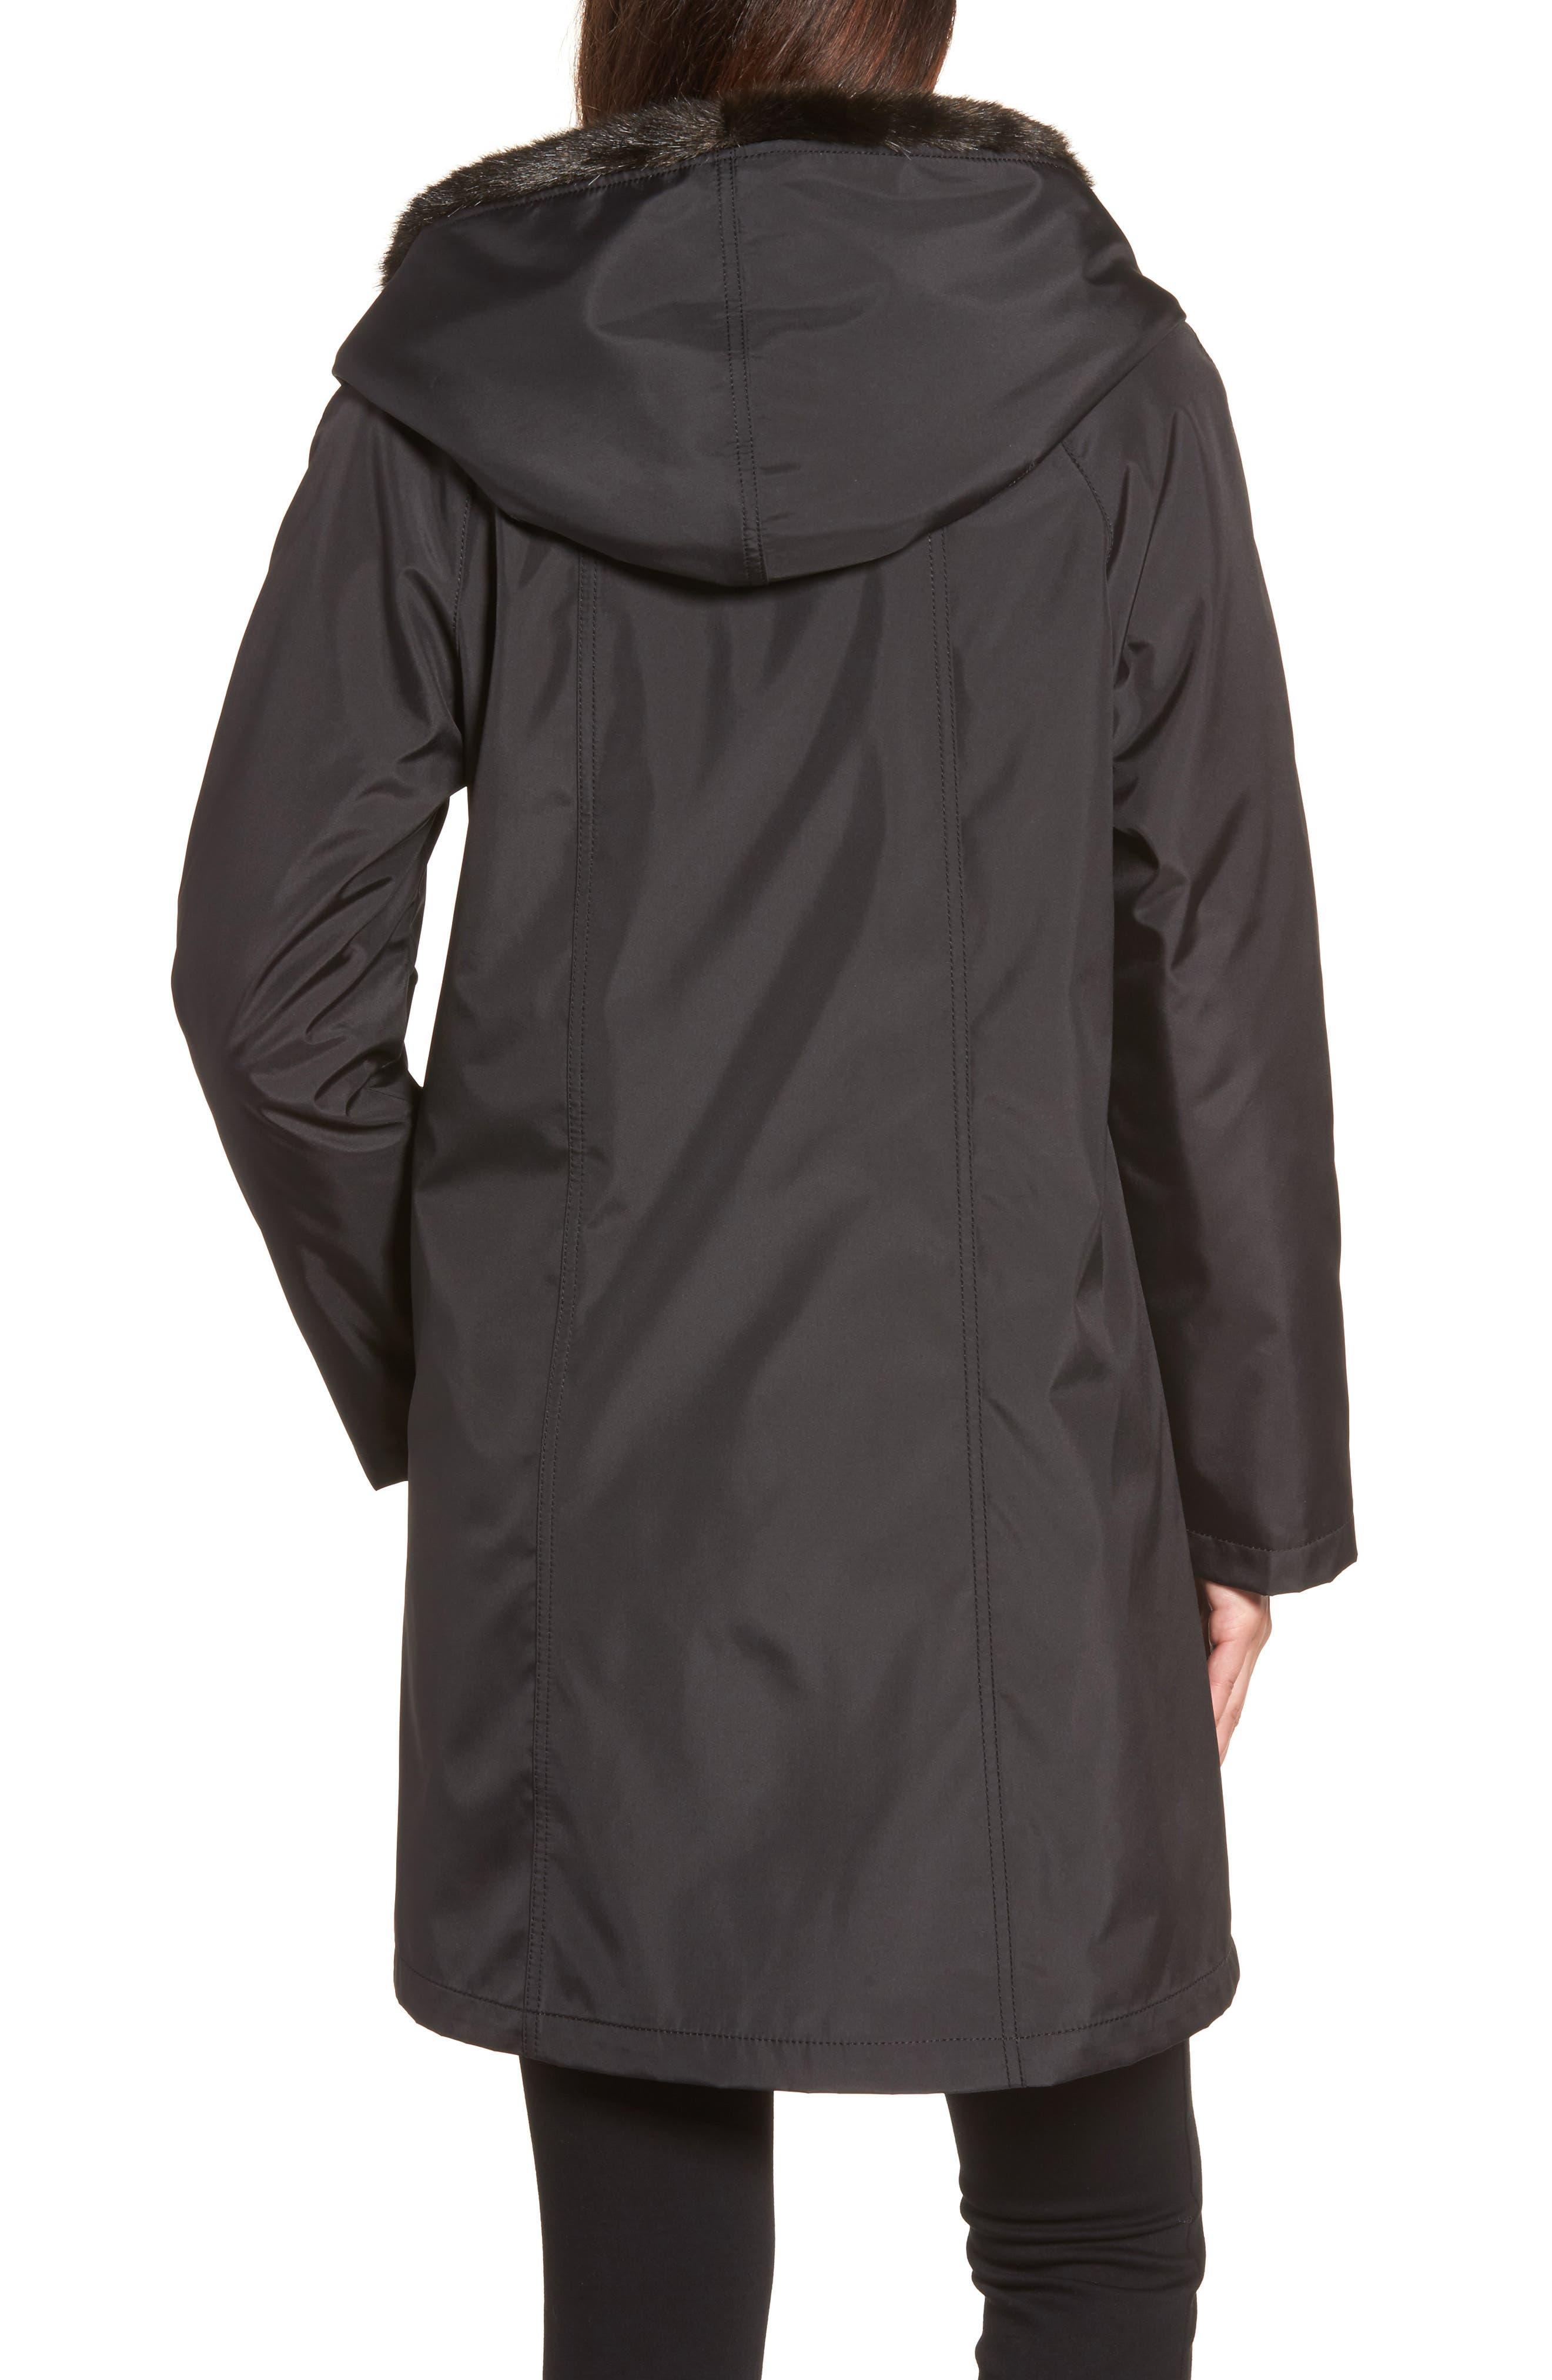 Storm Coat with Faux Fur Trim & Lining,                             Alternate thumbnail 2, color,                             001